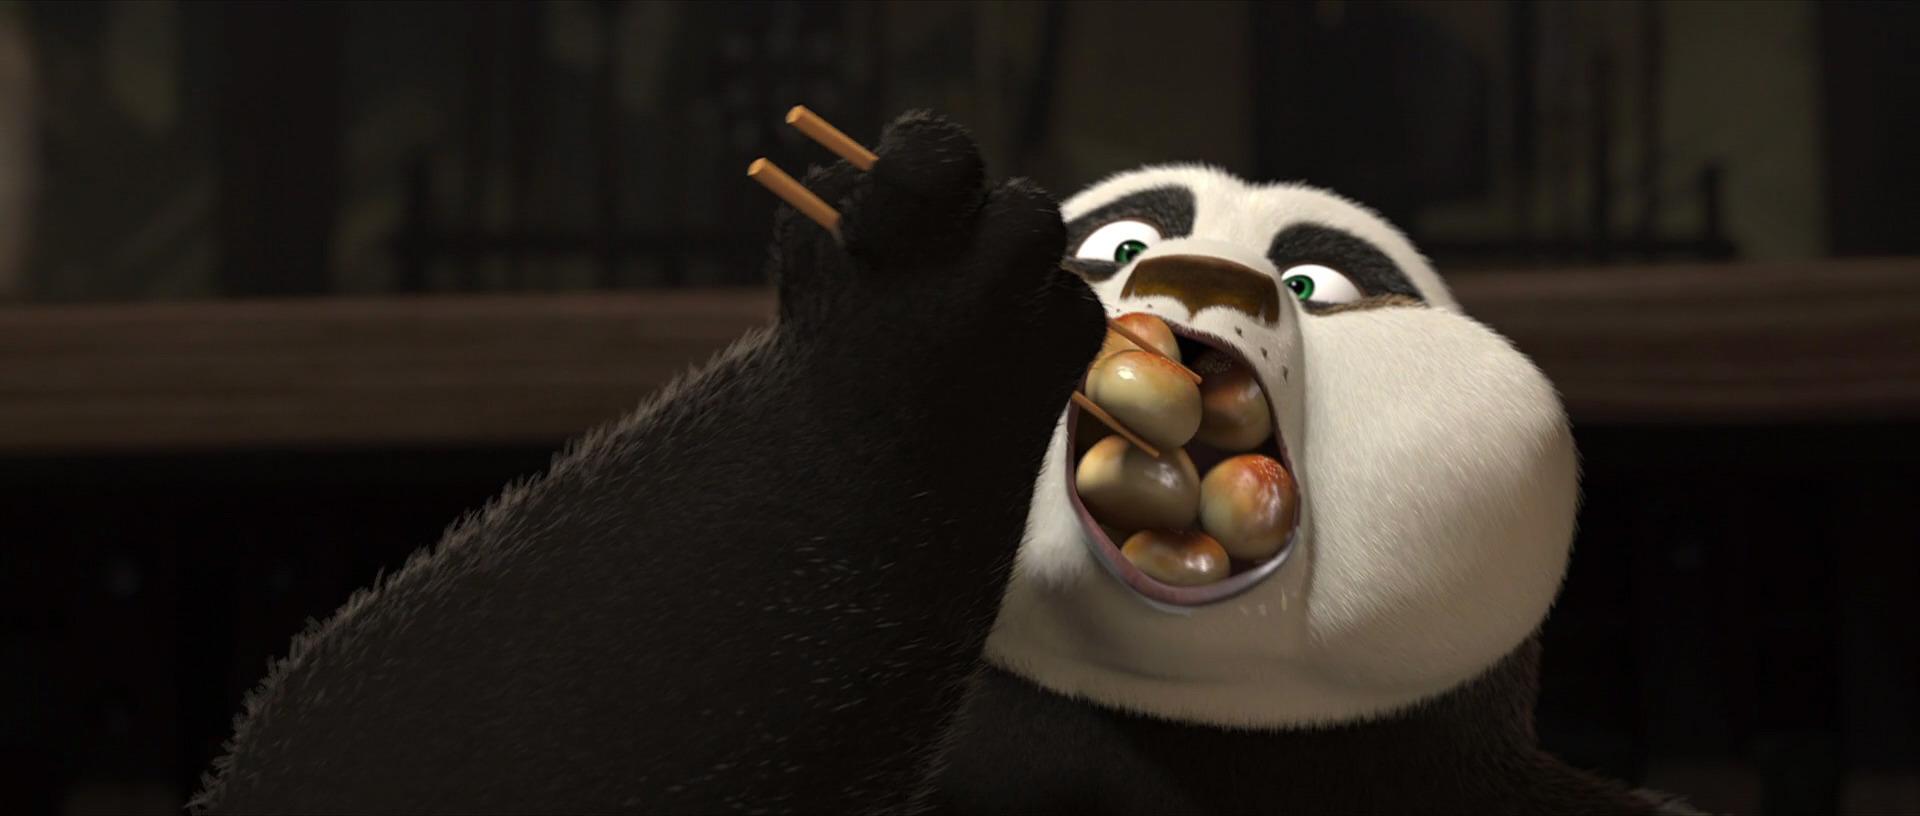 Kung Fu Panda Eating Image - PoBeanBuns.jpg...